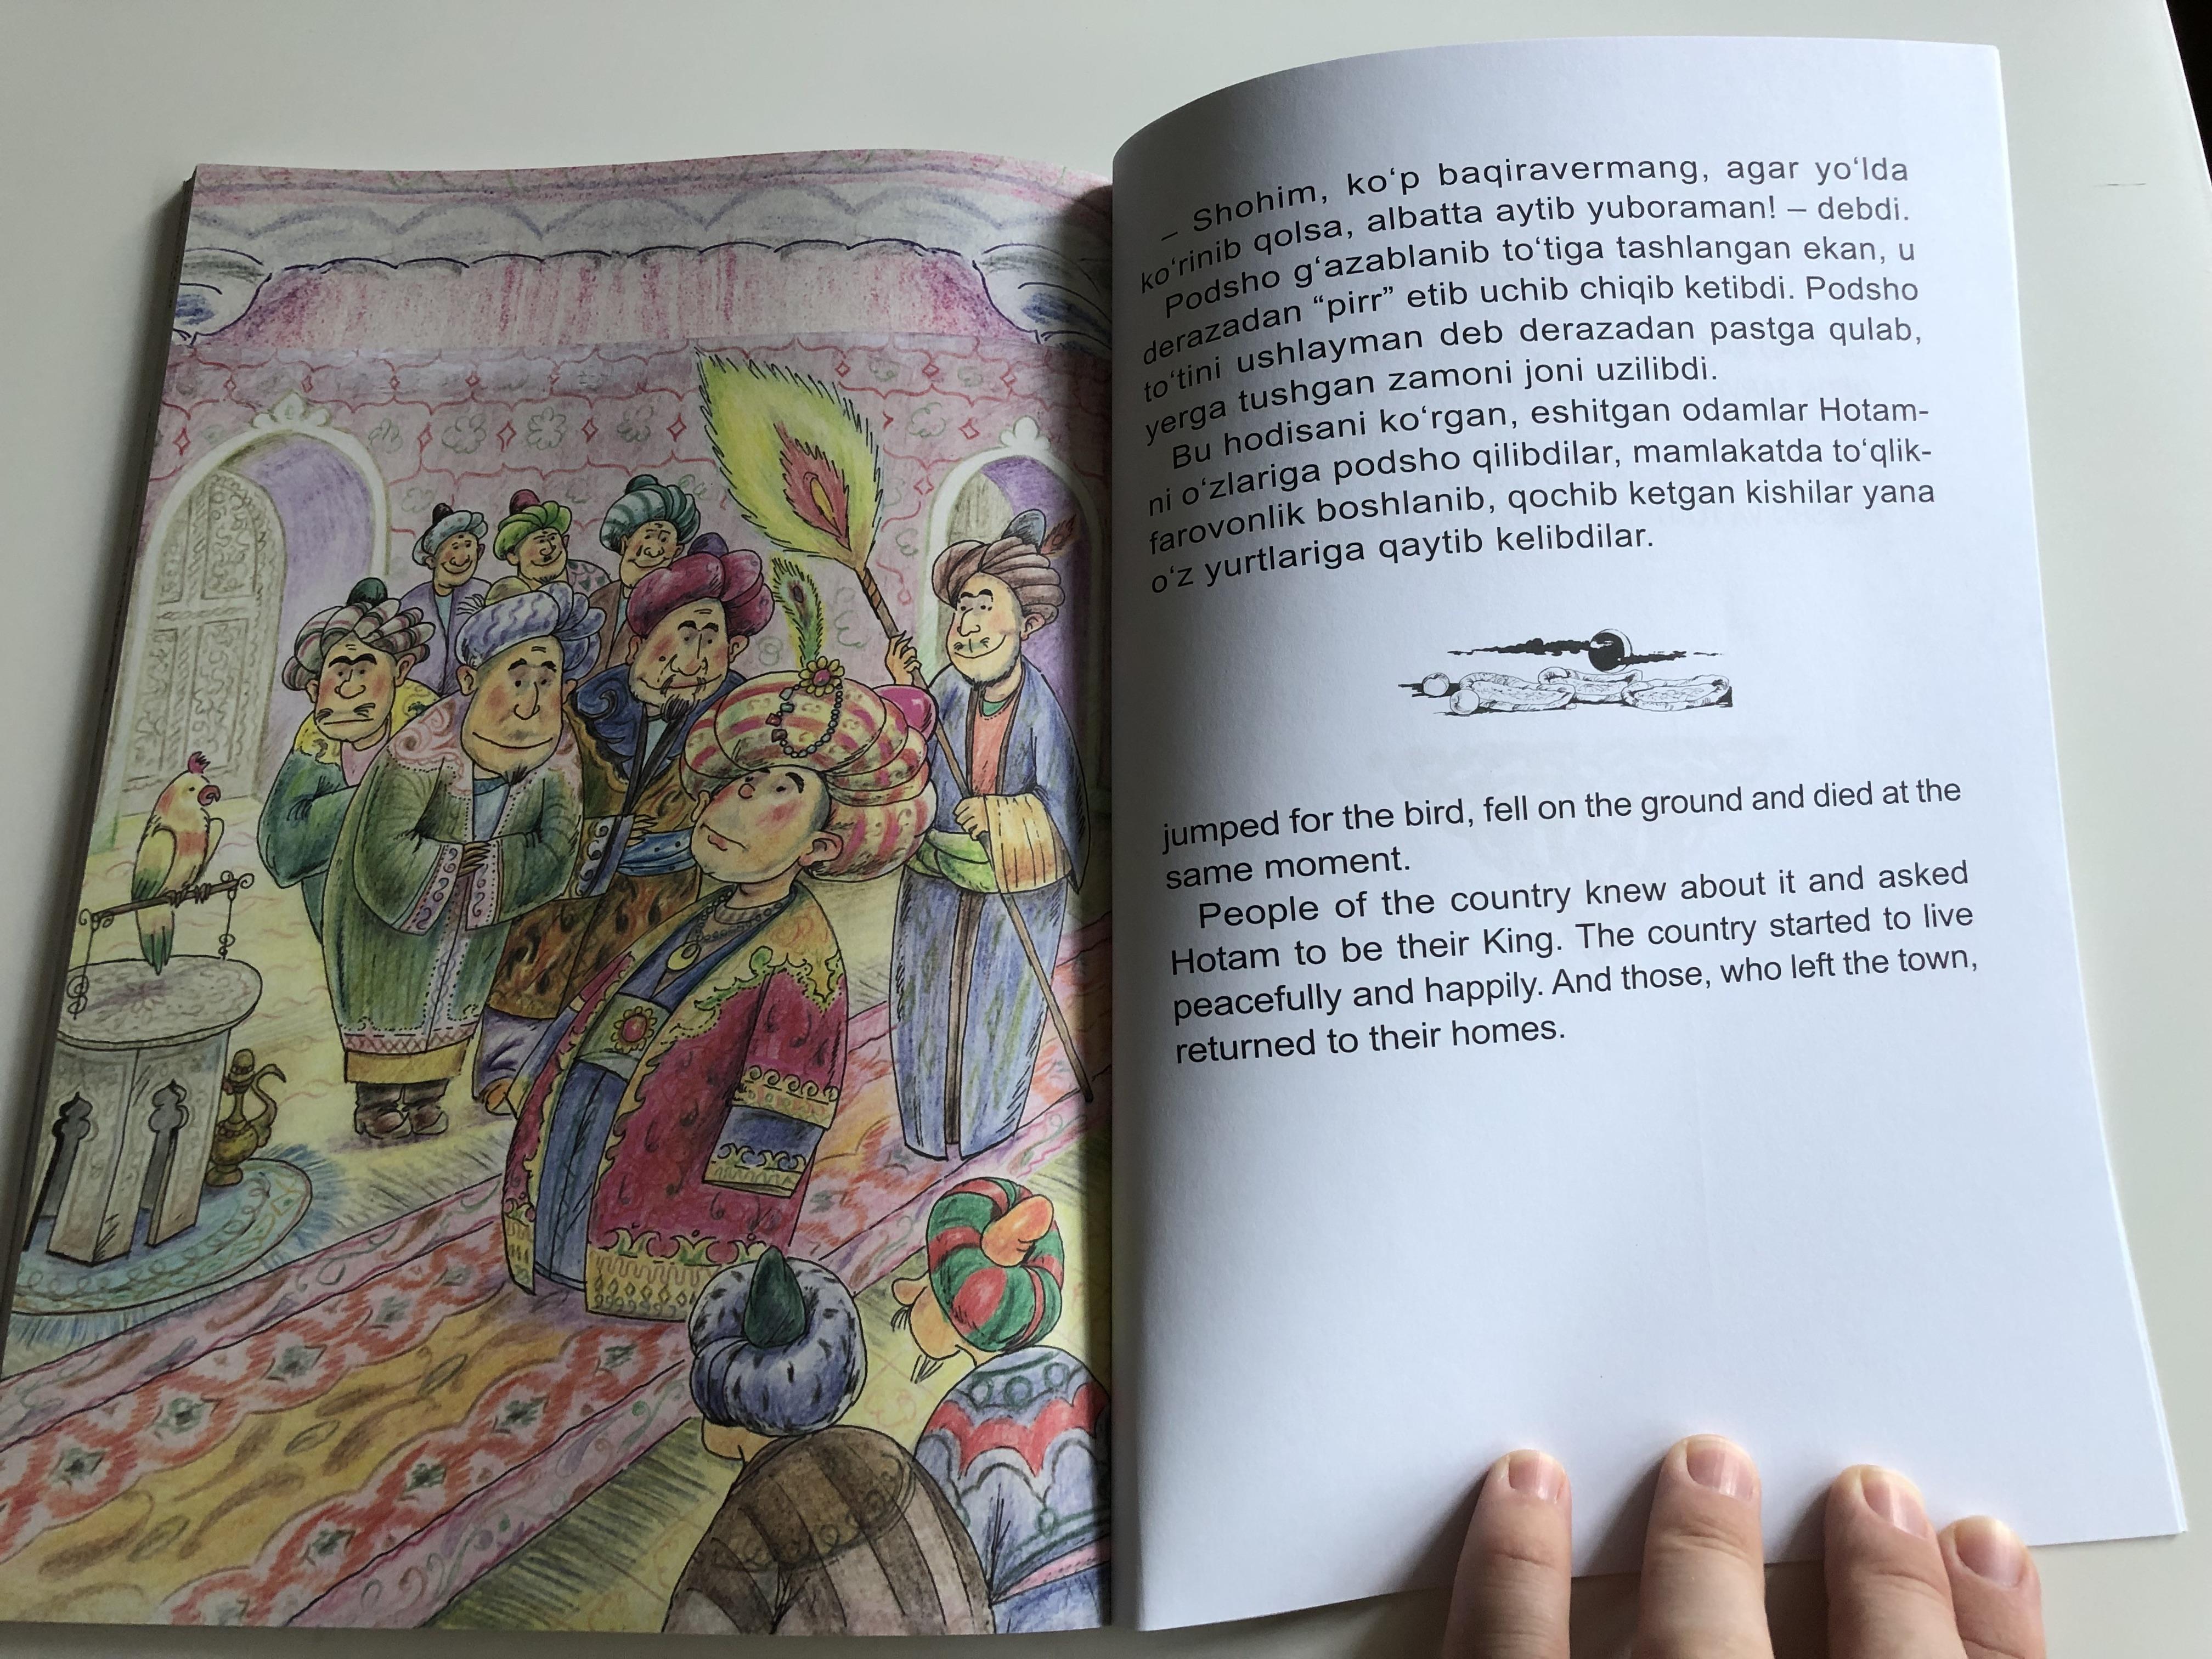 the-uzbek-folk-tales-o-zbek-xalq-ertaklari-by-husan-sodikov-uzbek-english-bilingual-edition-art-flex-paperback-2017-great-gift-for-children-10-.jpg